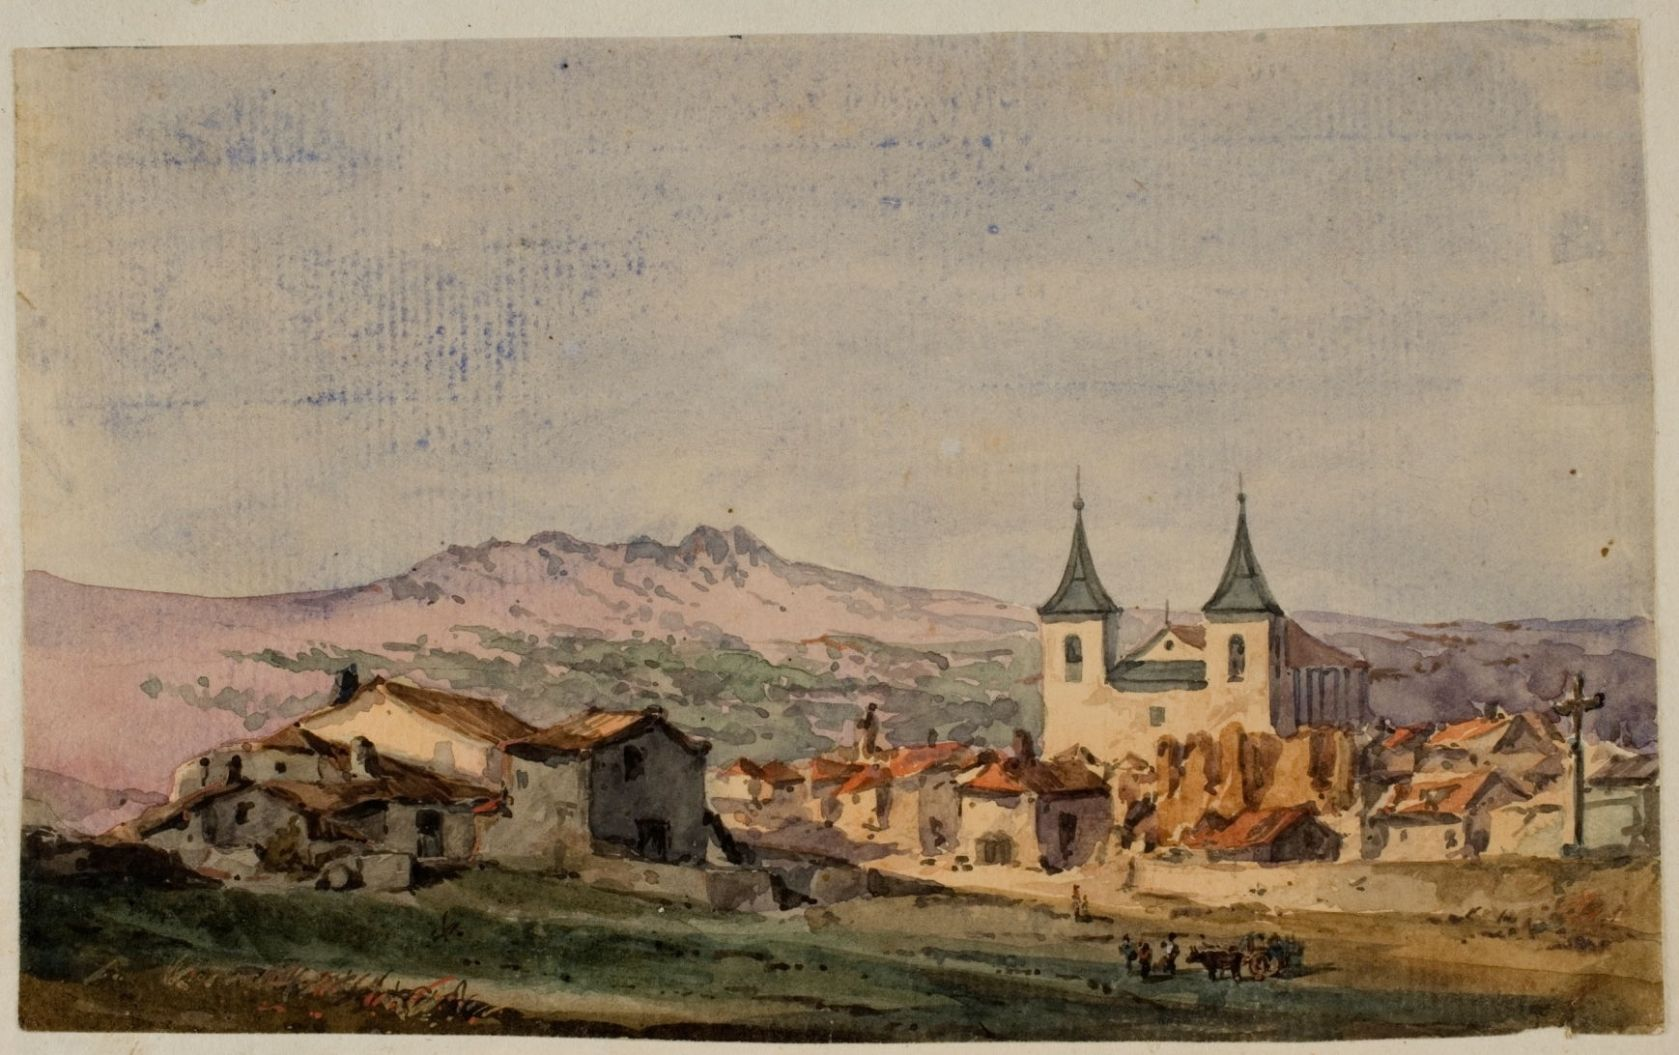 Landscapes of Martín Rico: 1 1852-1872